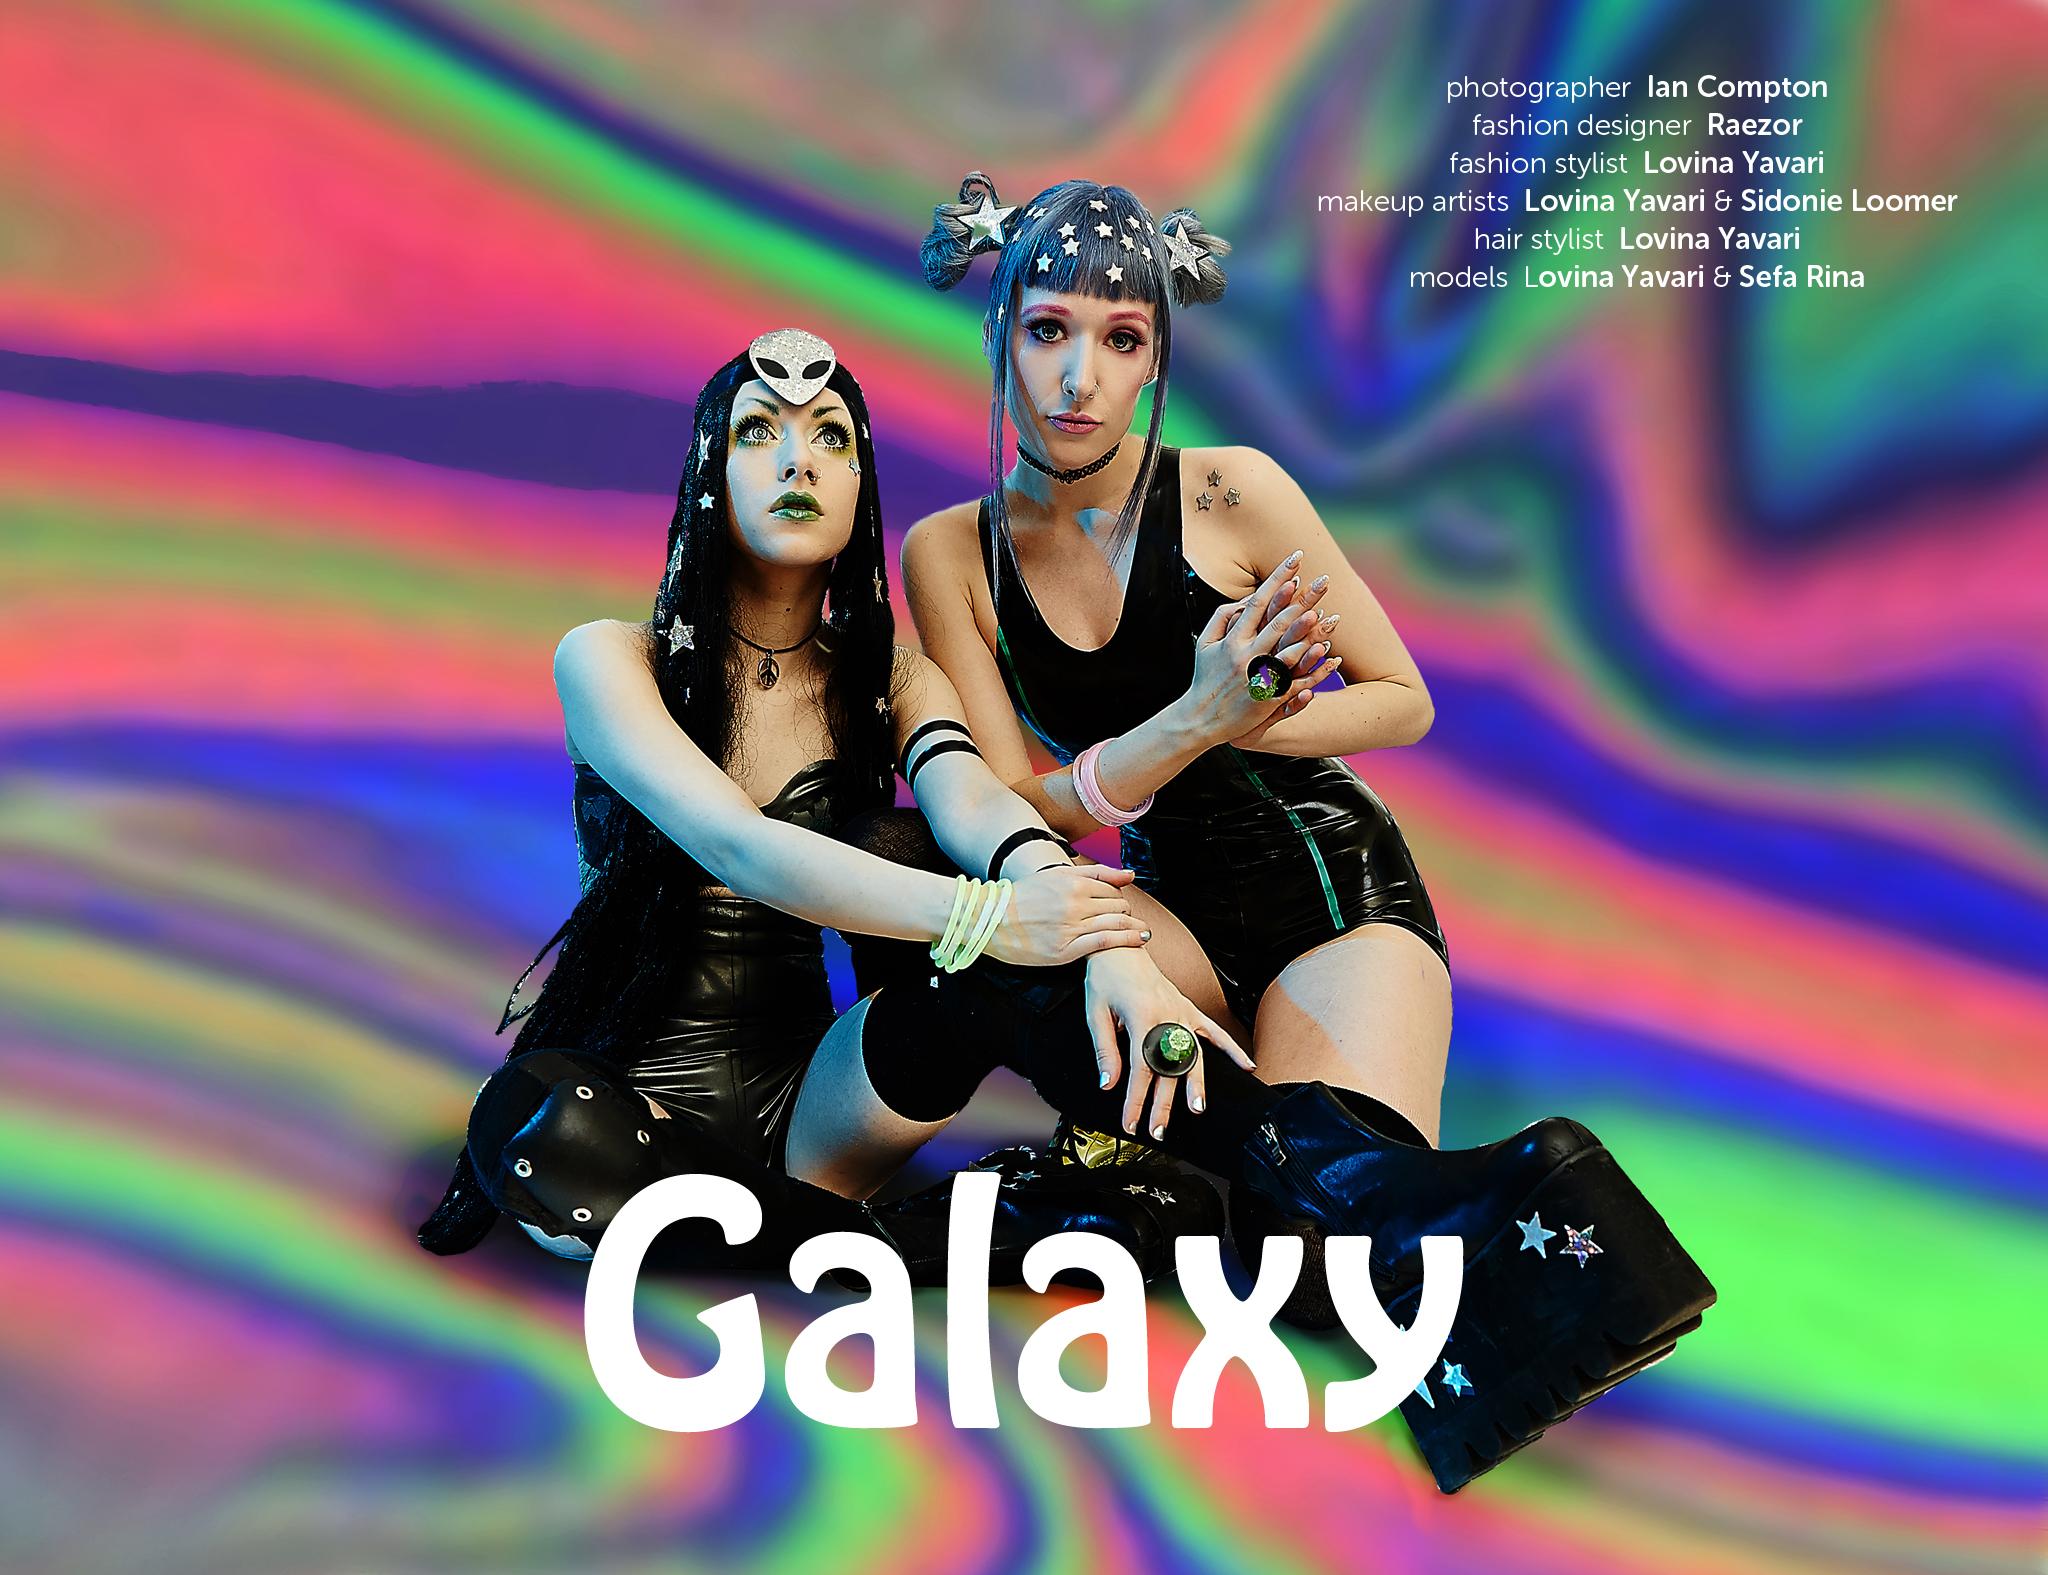 Auxiliary Galaxy Fashion Editorial featuring Raezor Latex